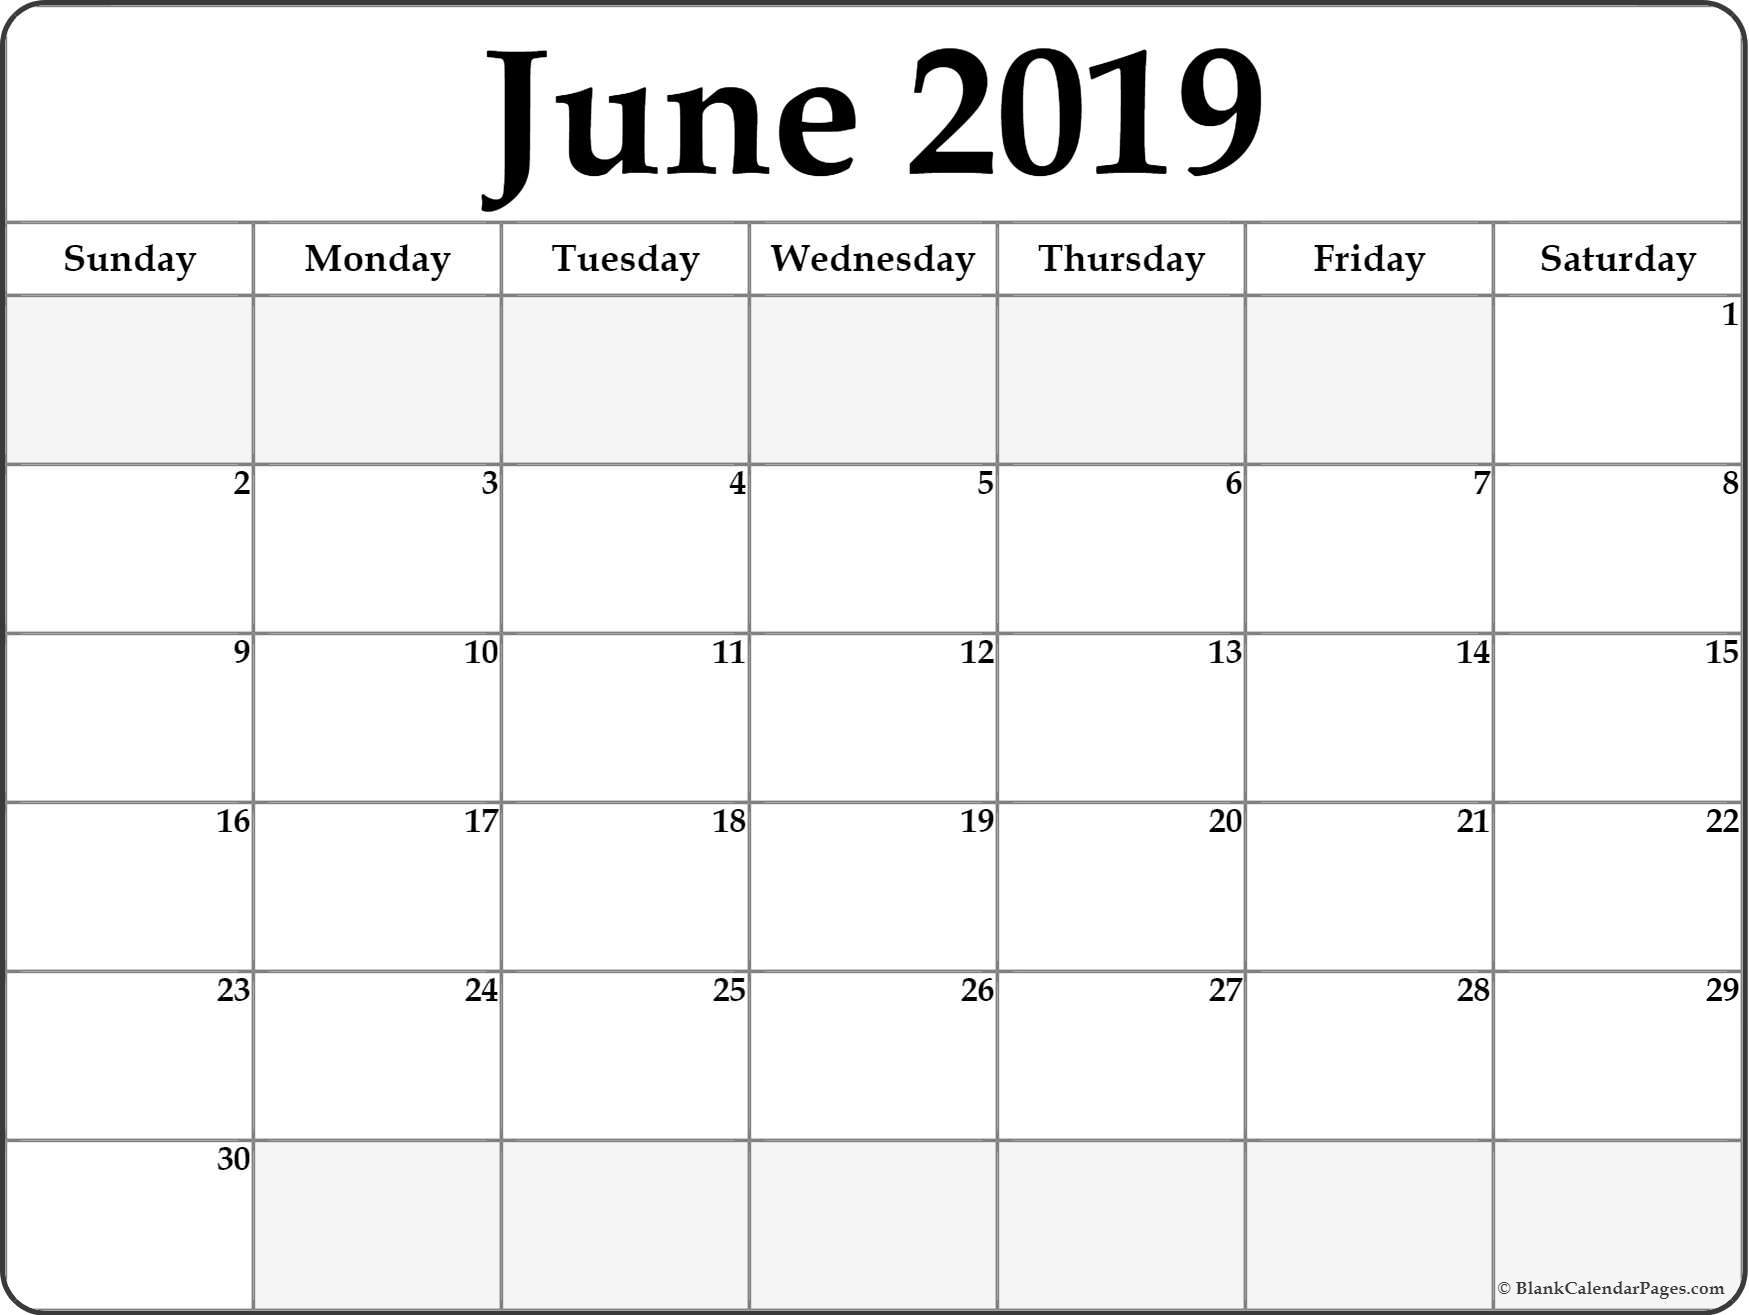 Blank Calendar.com